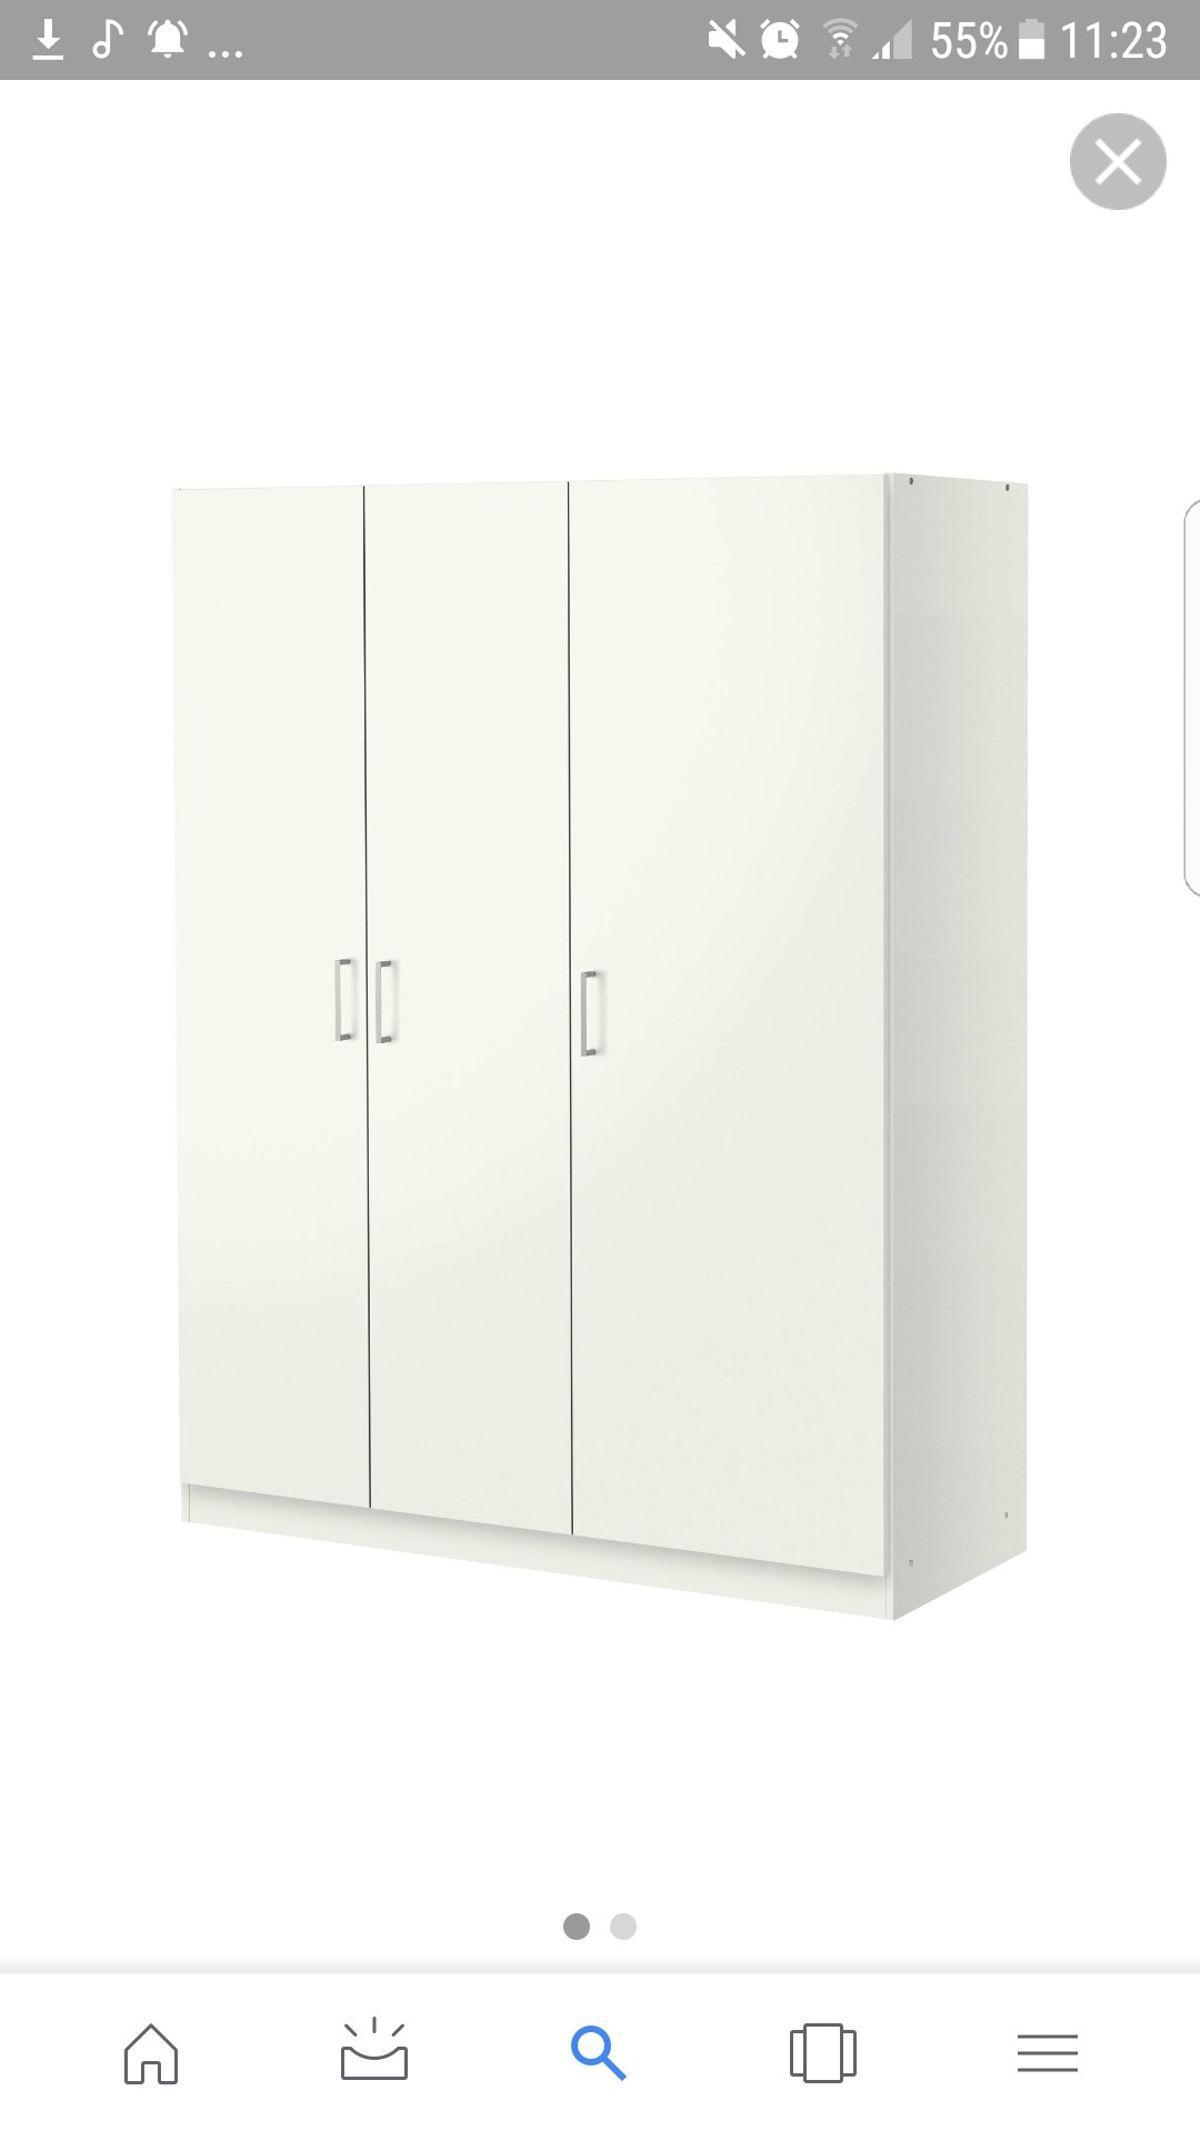 Kleiderschrank Ikea Dombas